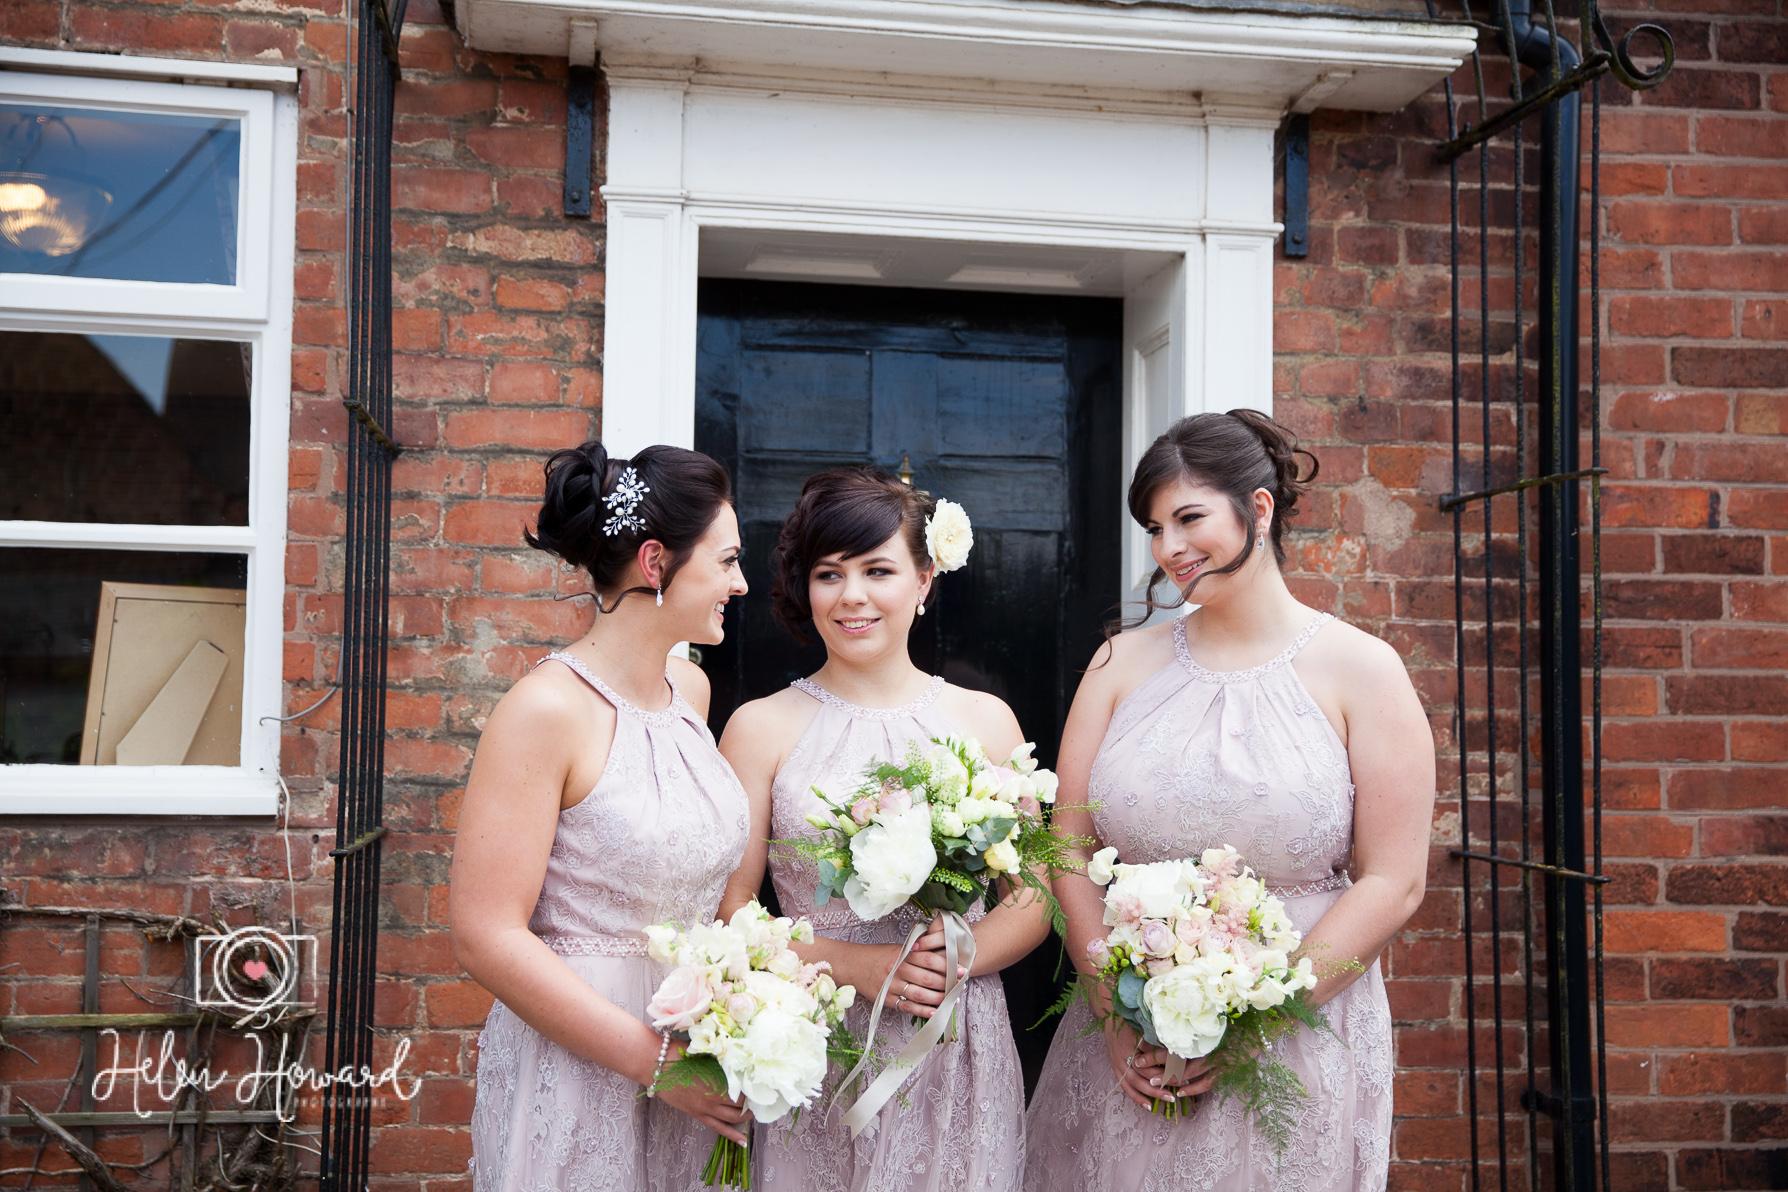 Helen Howard Photography Packington Moor Wedding-55.jpg